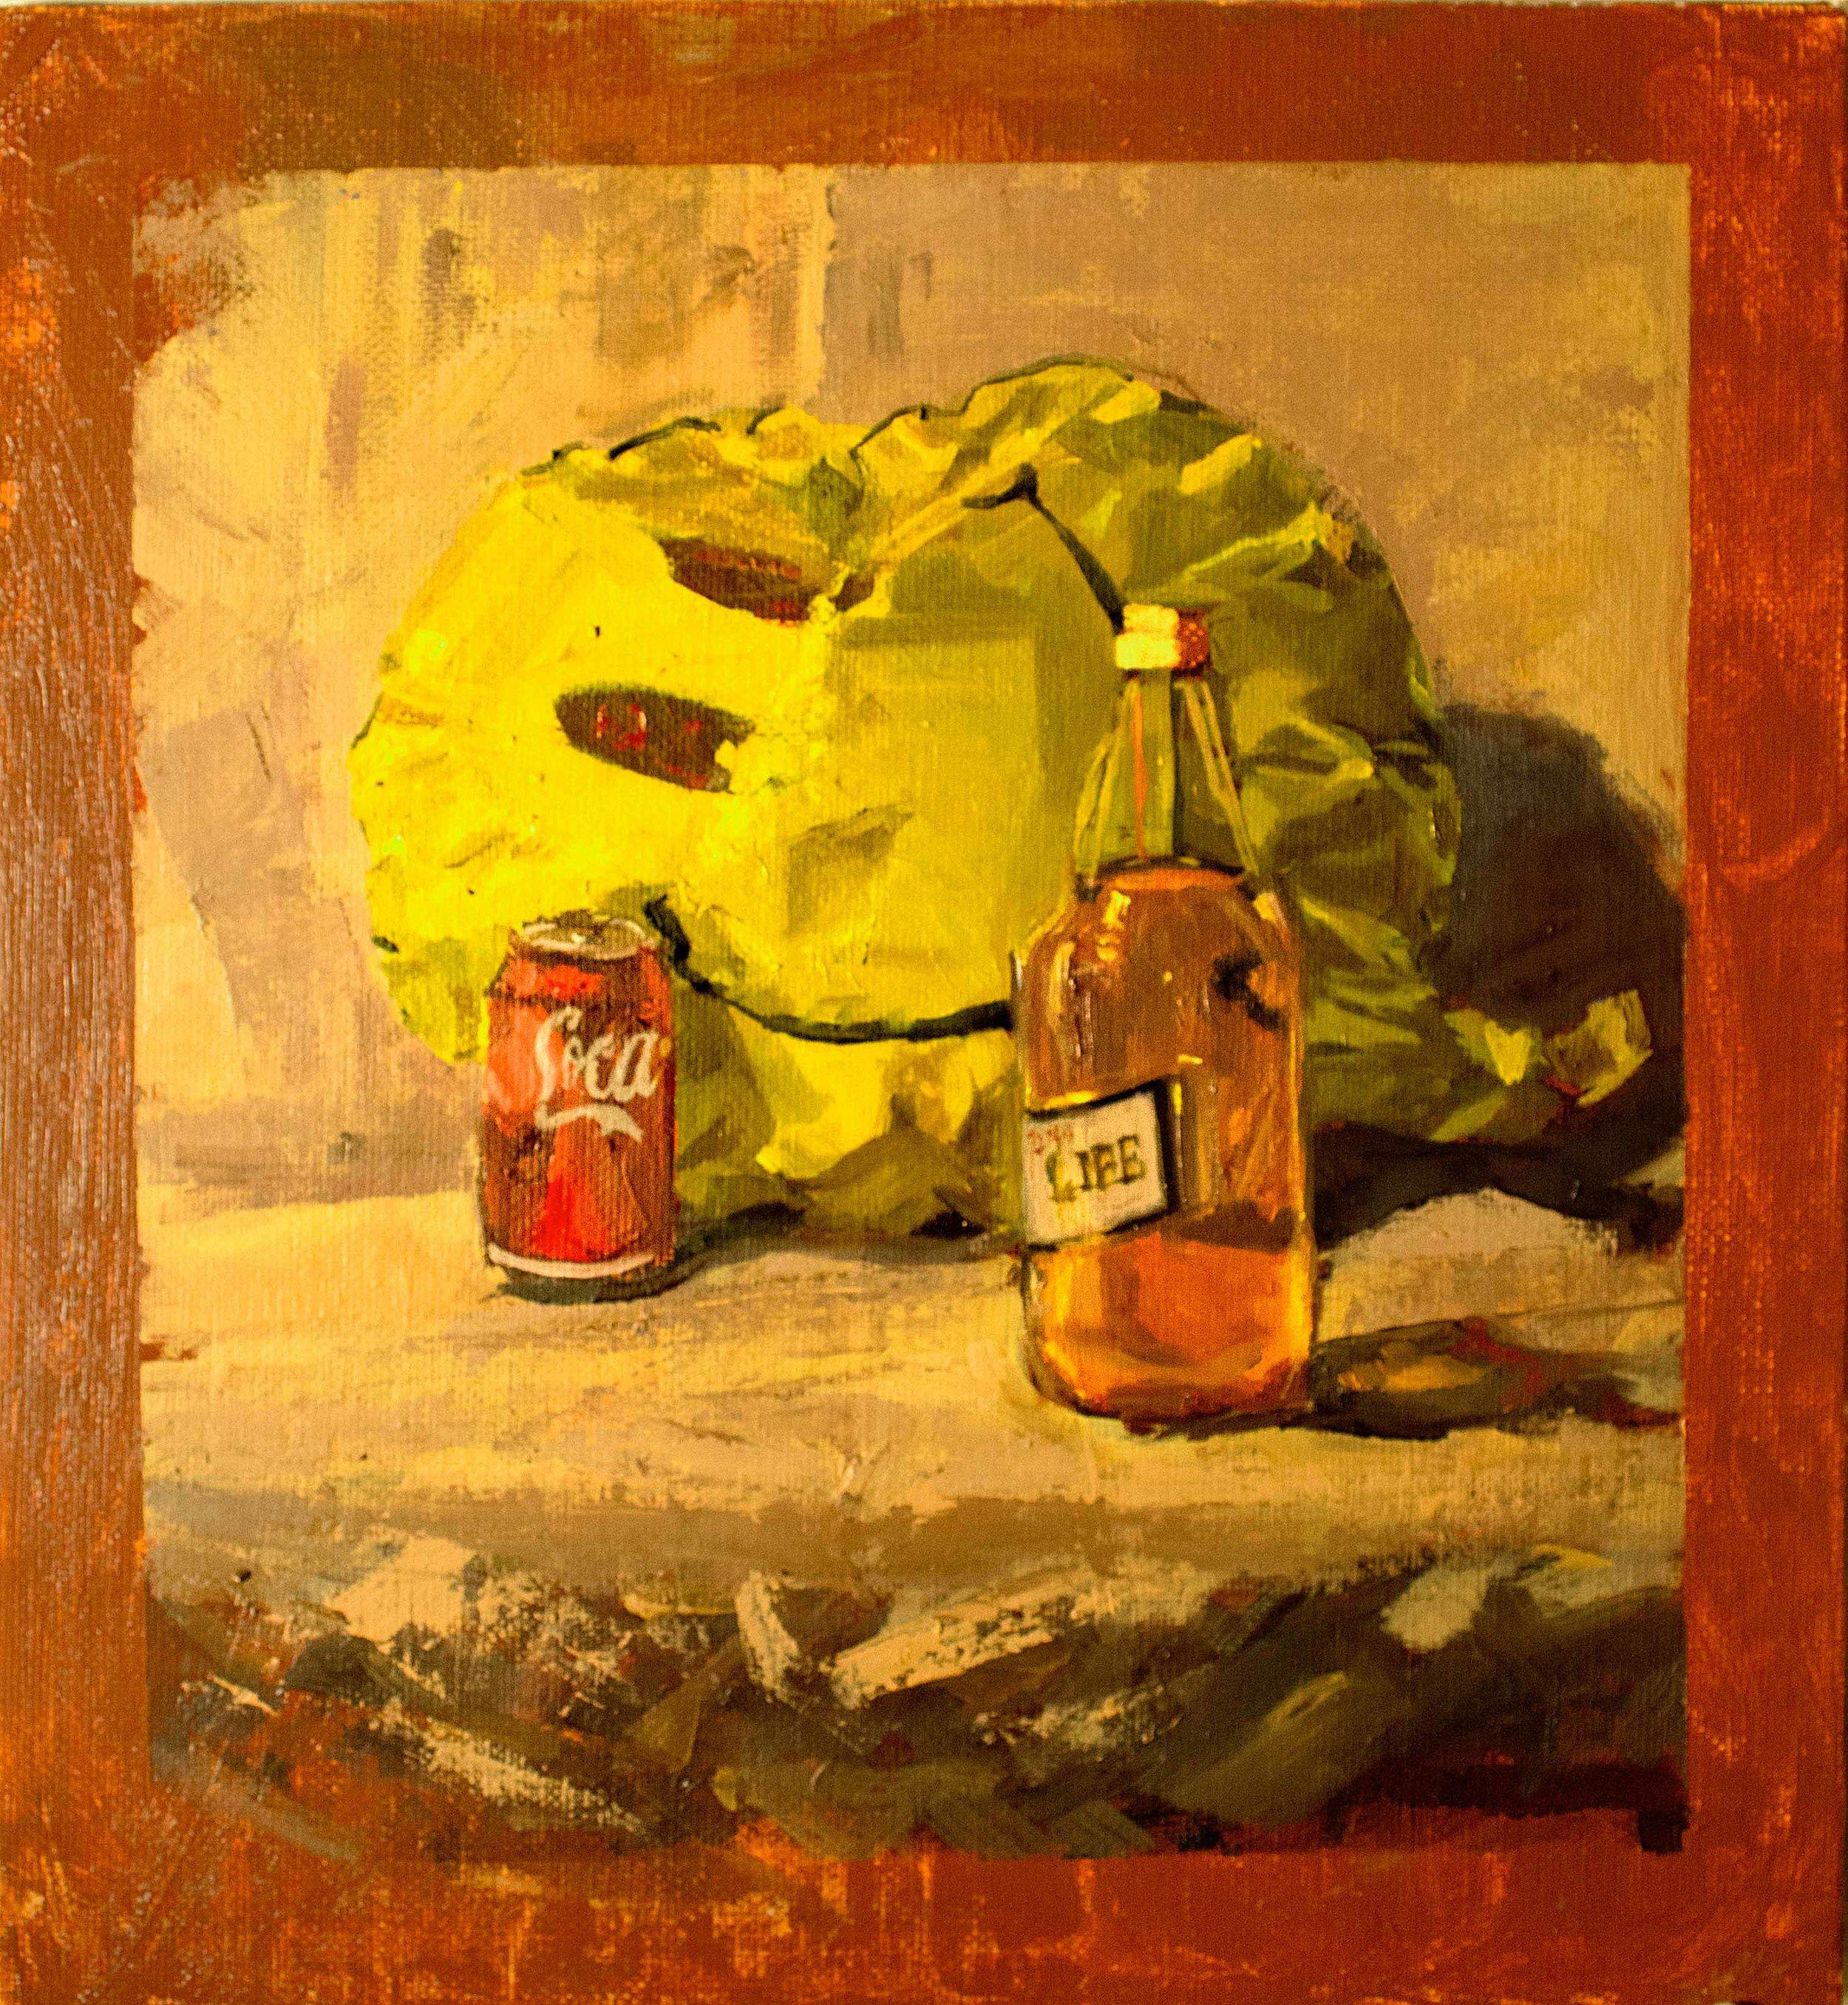 Coca Life, oil on canvas, 12 x 12 in